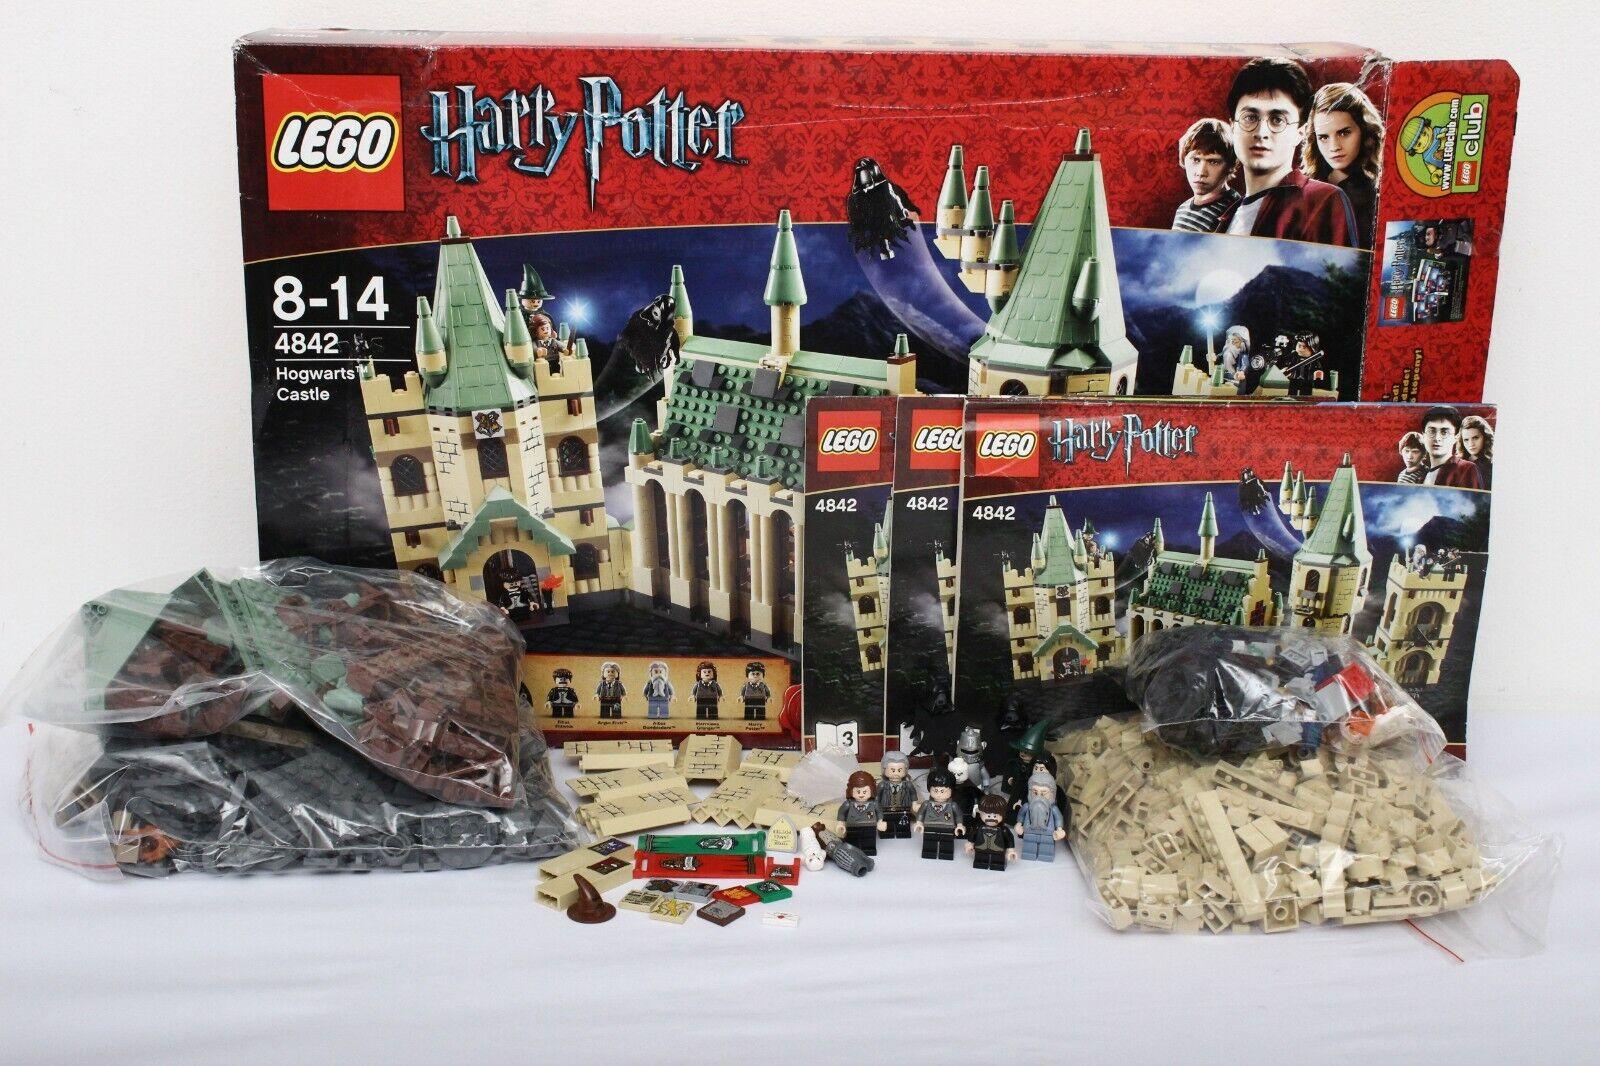 Lego Harry  Potter Set 4842-1 Hogwarts Castle 100% completare + instructions + scatola  nuova esclusiva di fascia alta